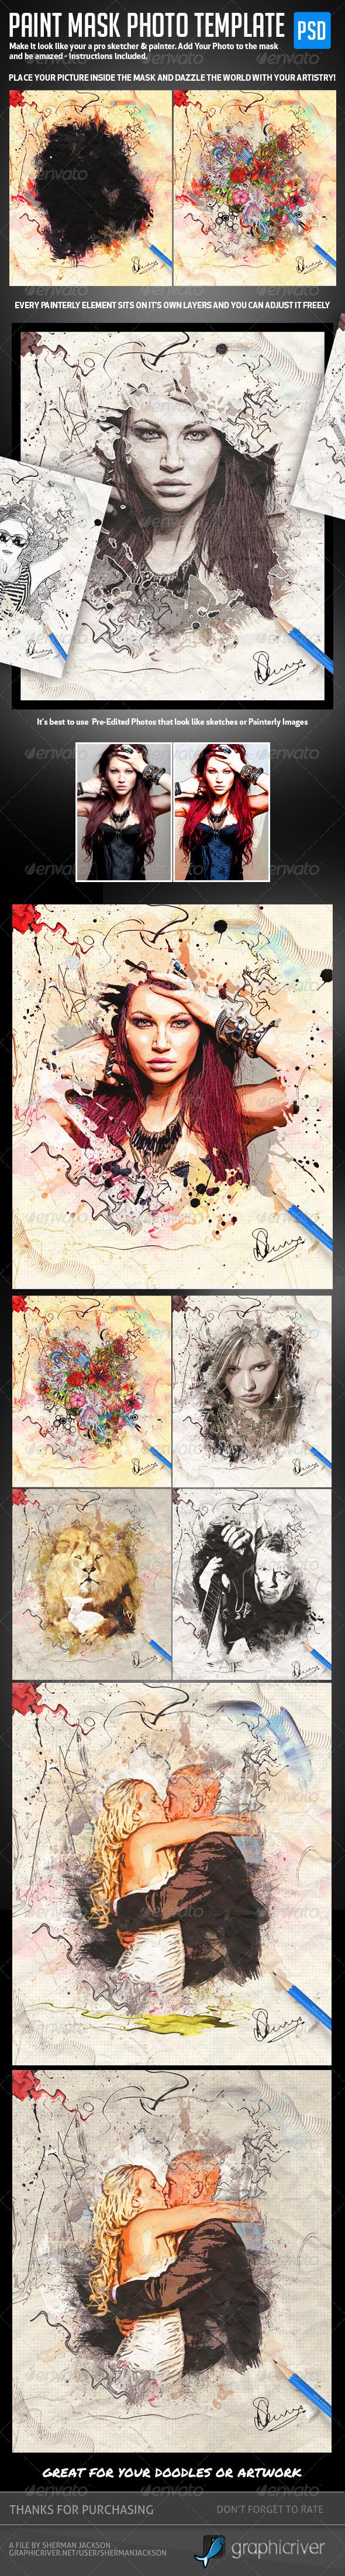 Paint Mask Photo Template v1 - Artistic Photo Templates